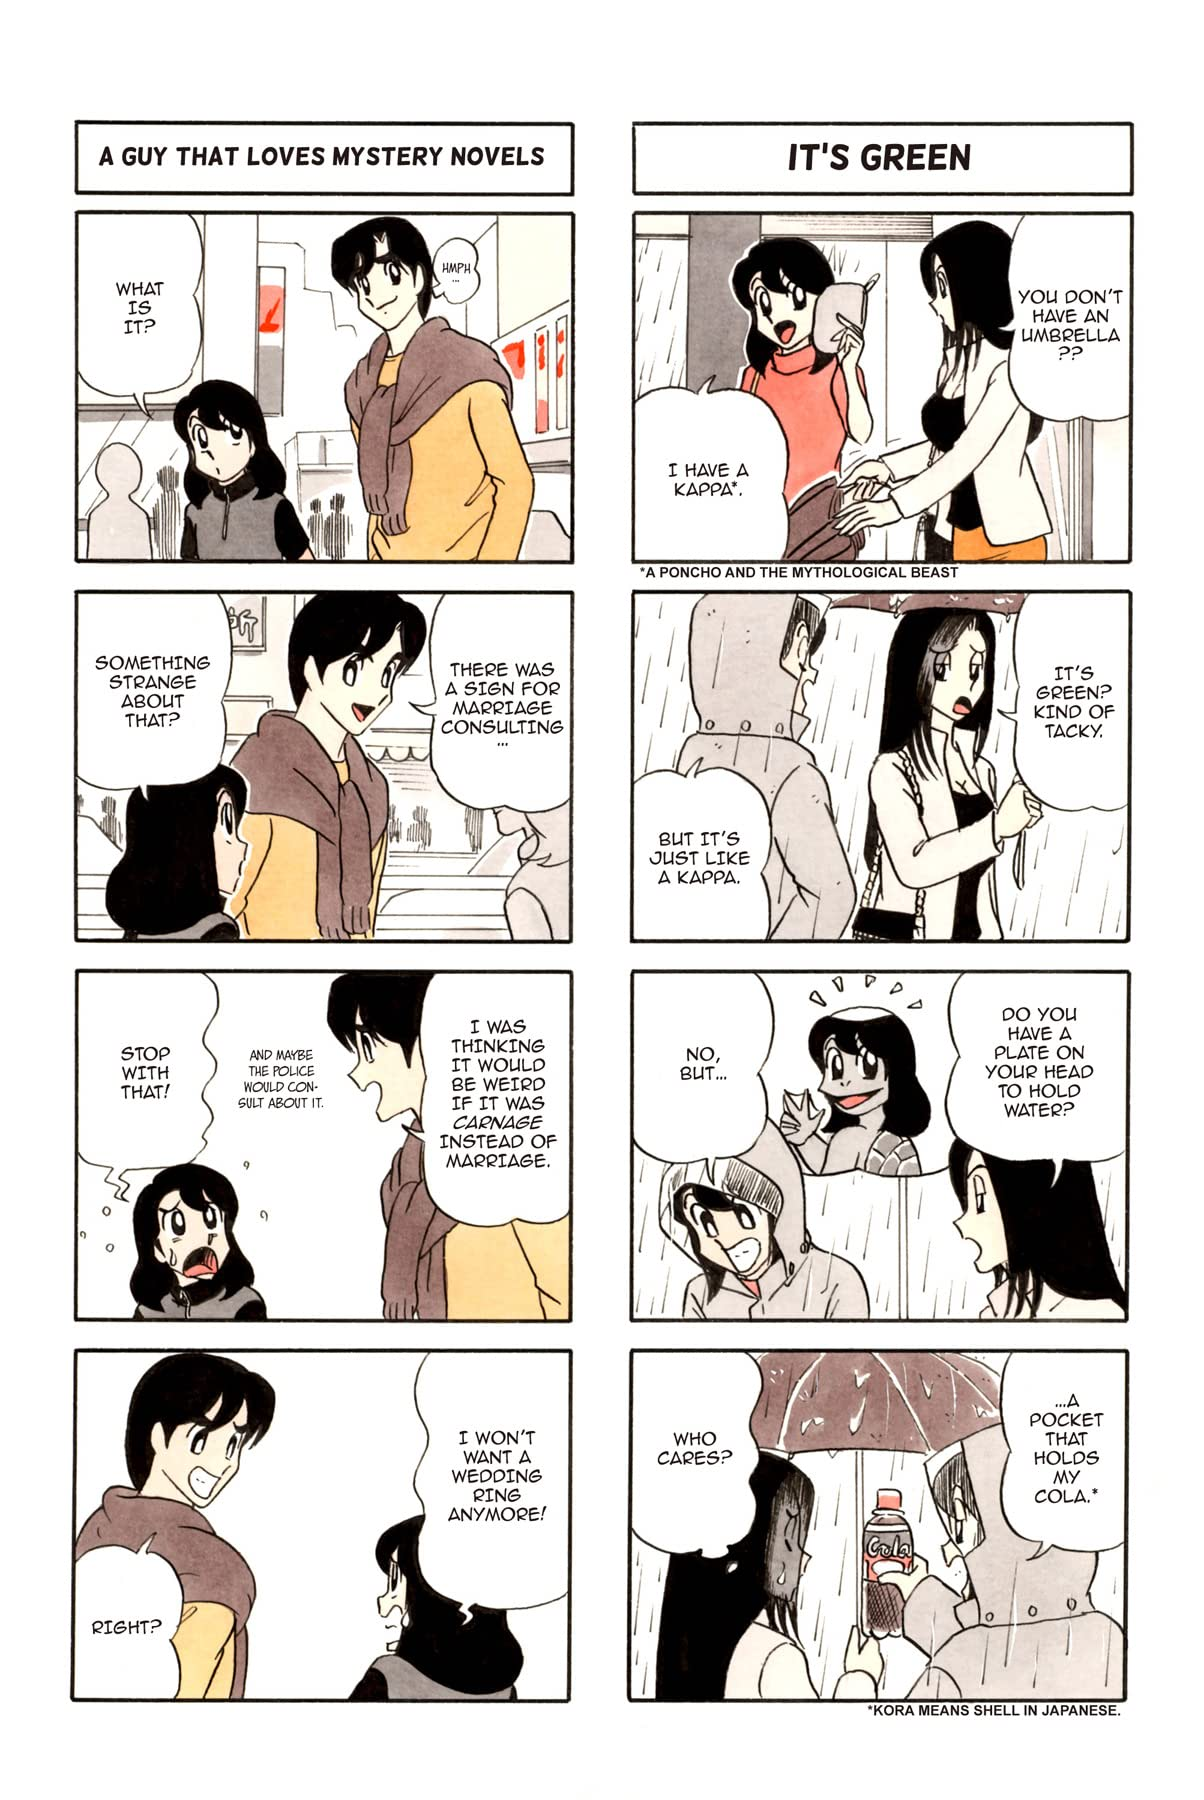 IT'S NAOMI, OKAY? AFTER 16 #10